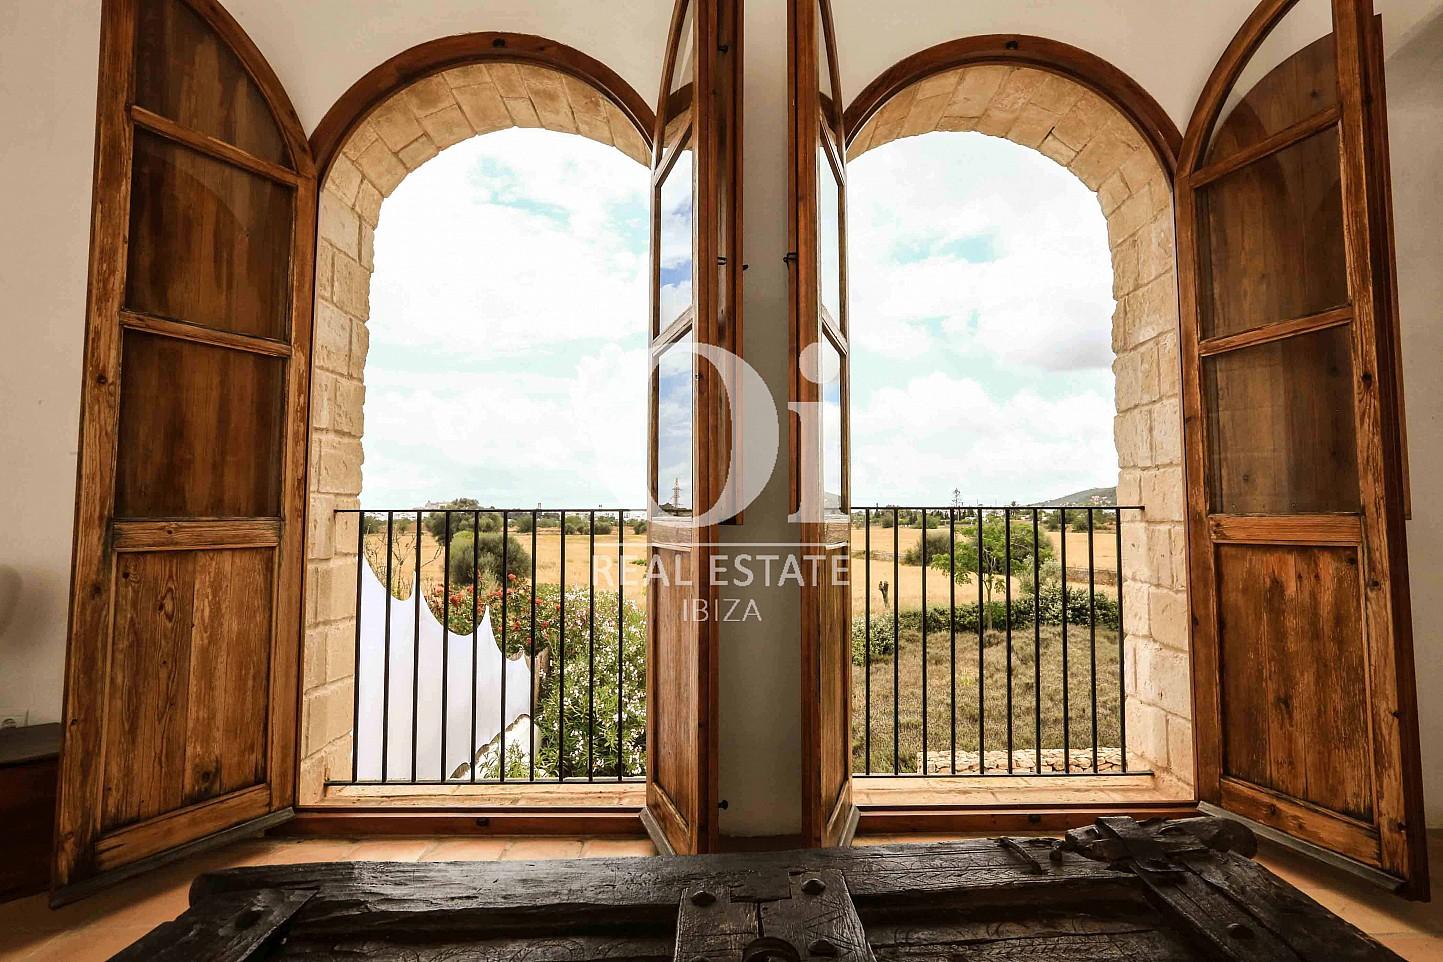 Balcón con preciosas vistas de casa de alquiler de estancia en Puig d'en Valls, Ibiza